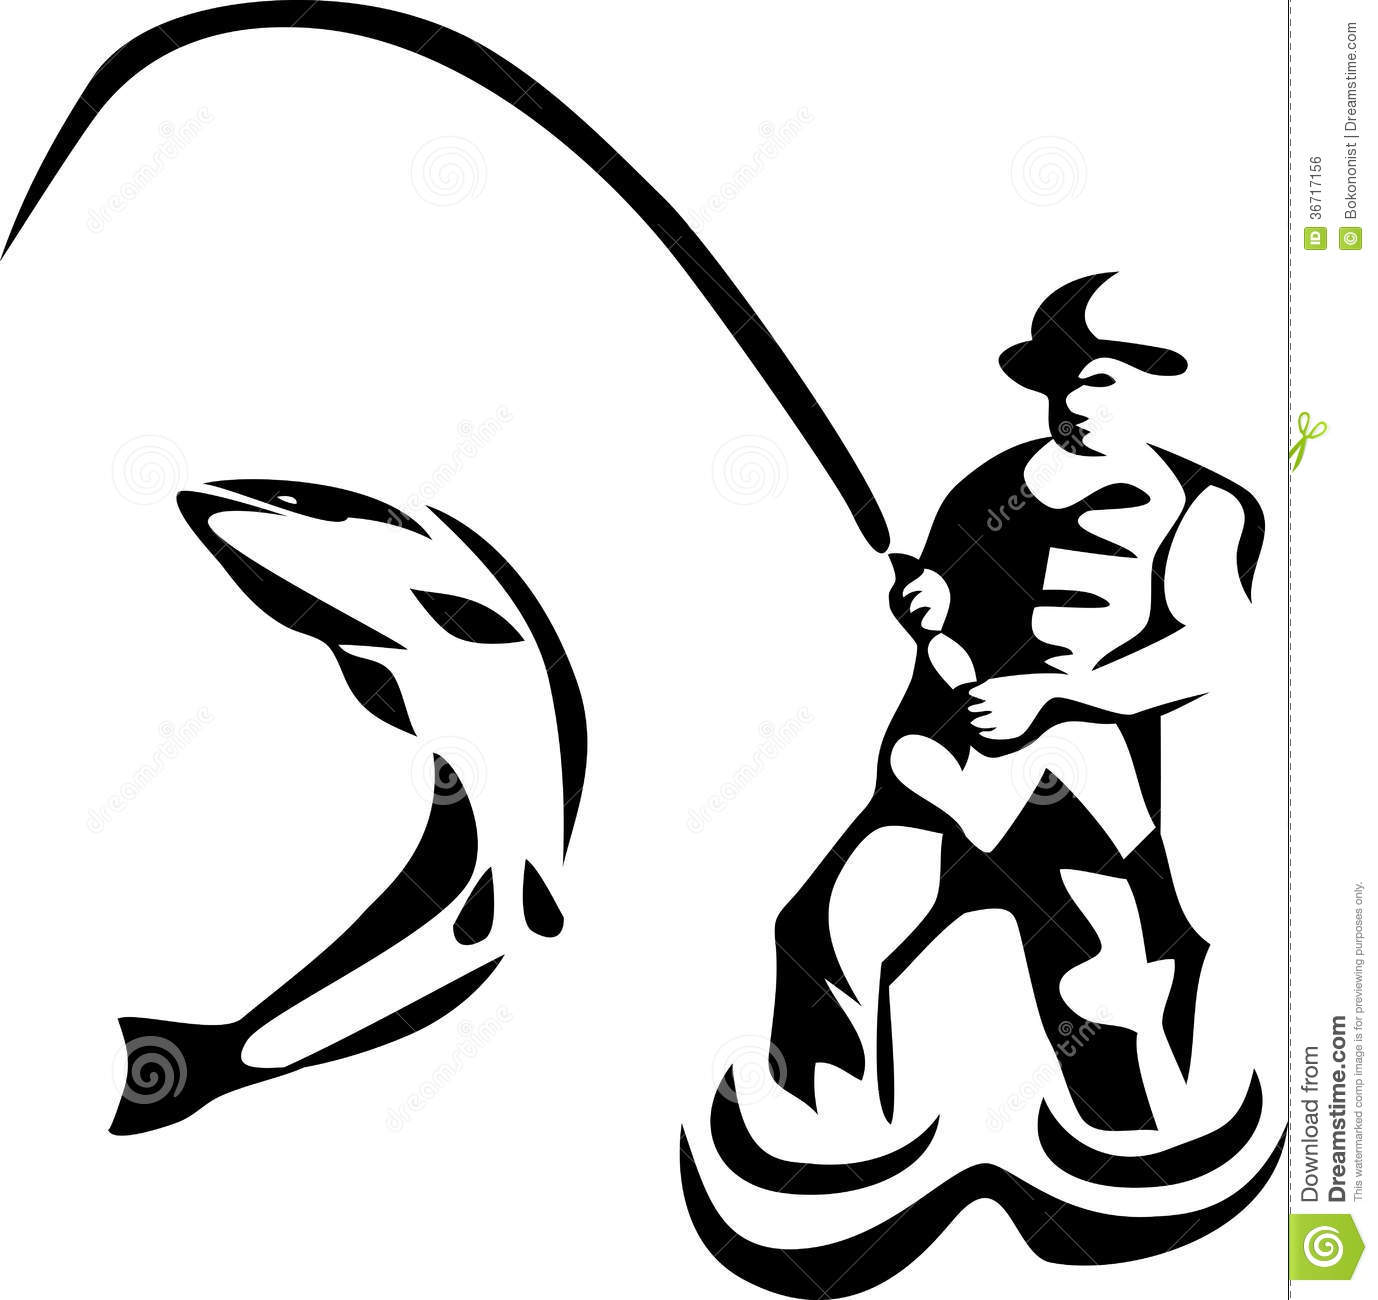 1378x1300 Drawn Fishing Black And White